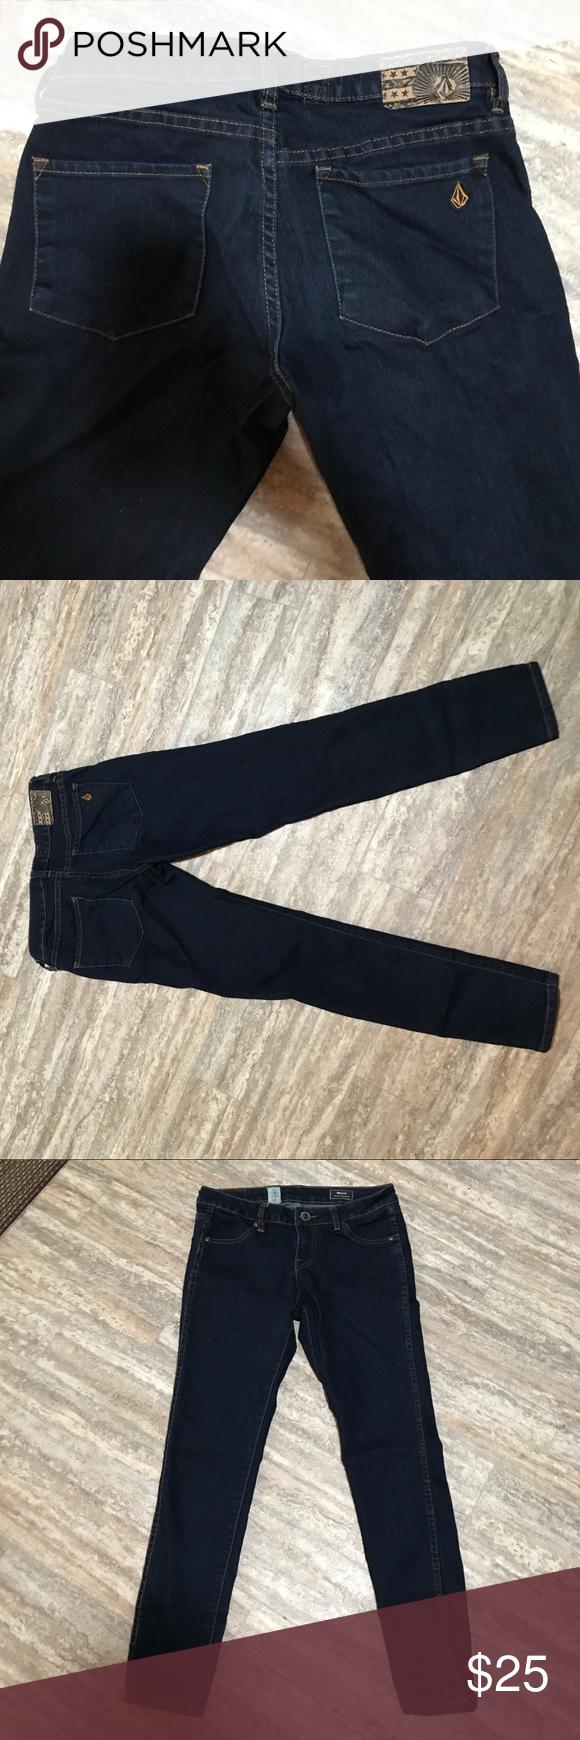 Volcom skinny jeans 👖 size 27 new New Volcom skinny railed shortie legging fit jeans size 27 Volcom Jeans Skinny